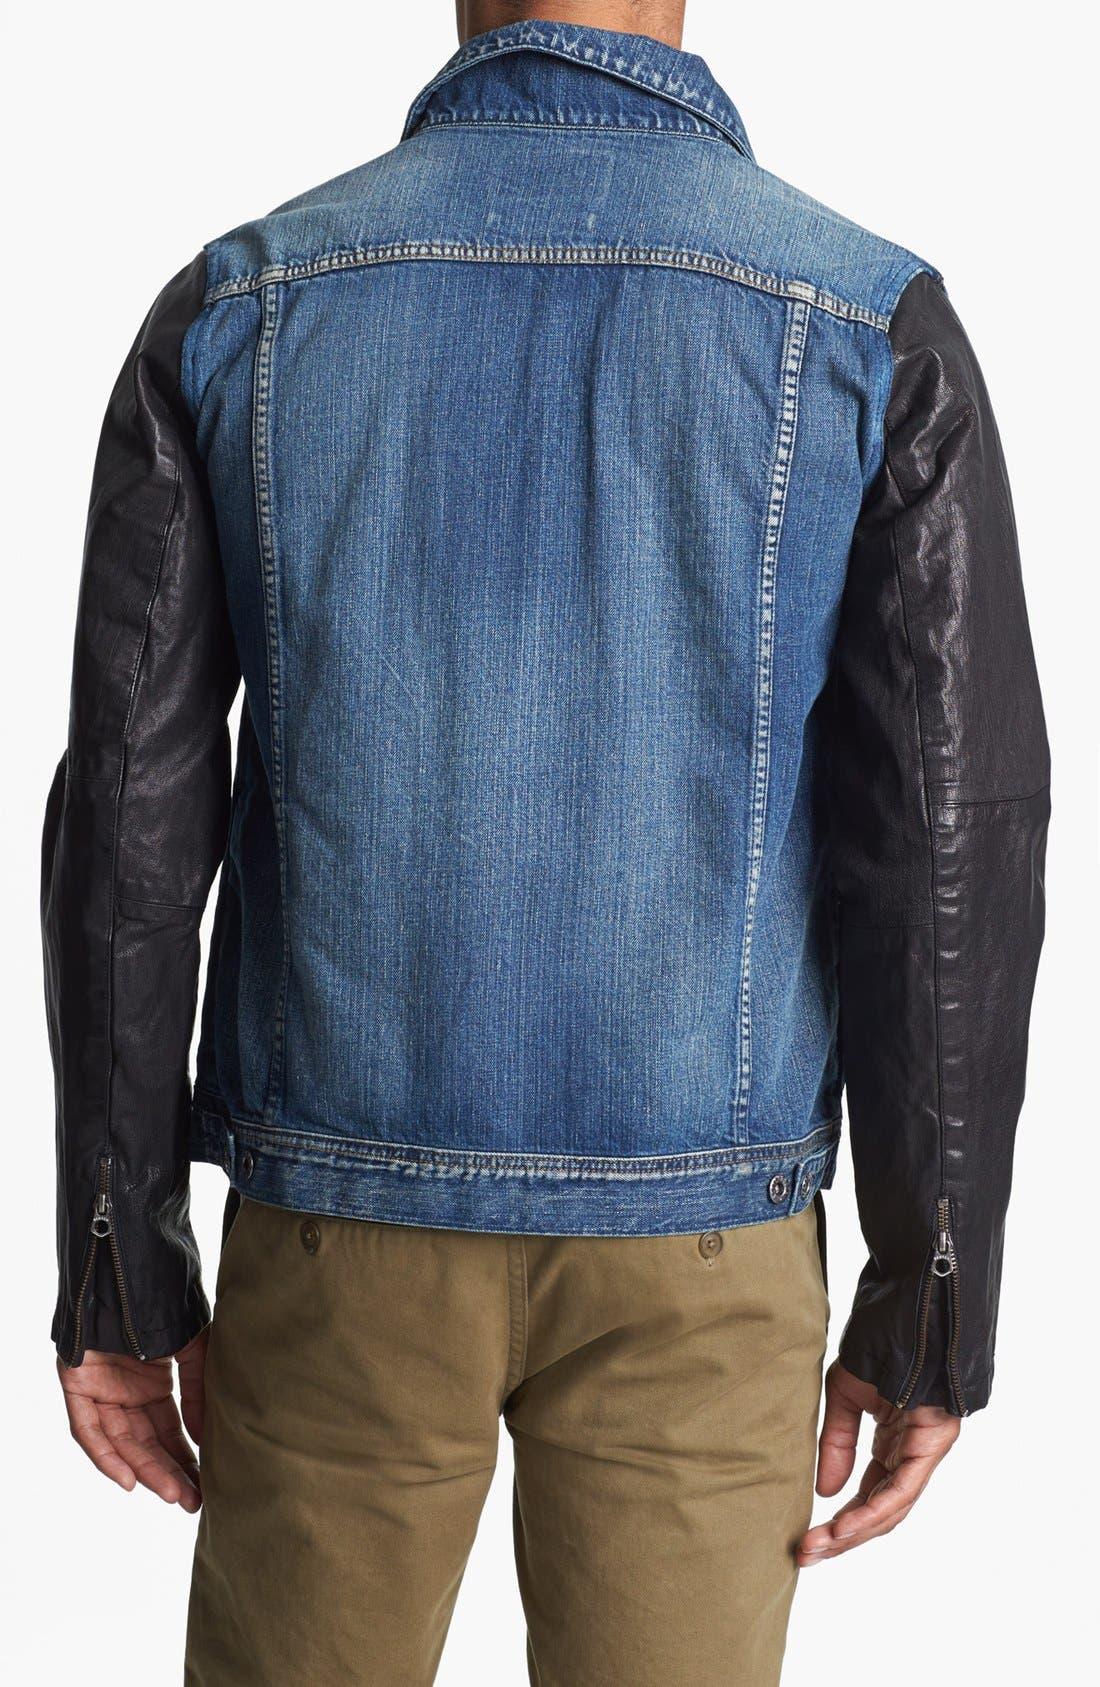 Alternate Image 2  - Scotch & Soda Denim Jacket with Leather Sleeves